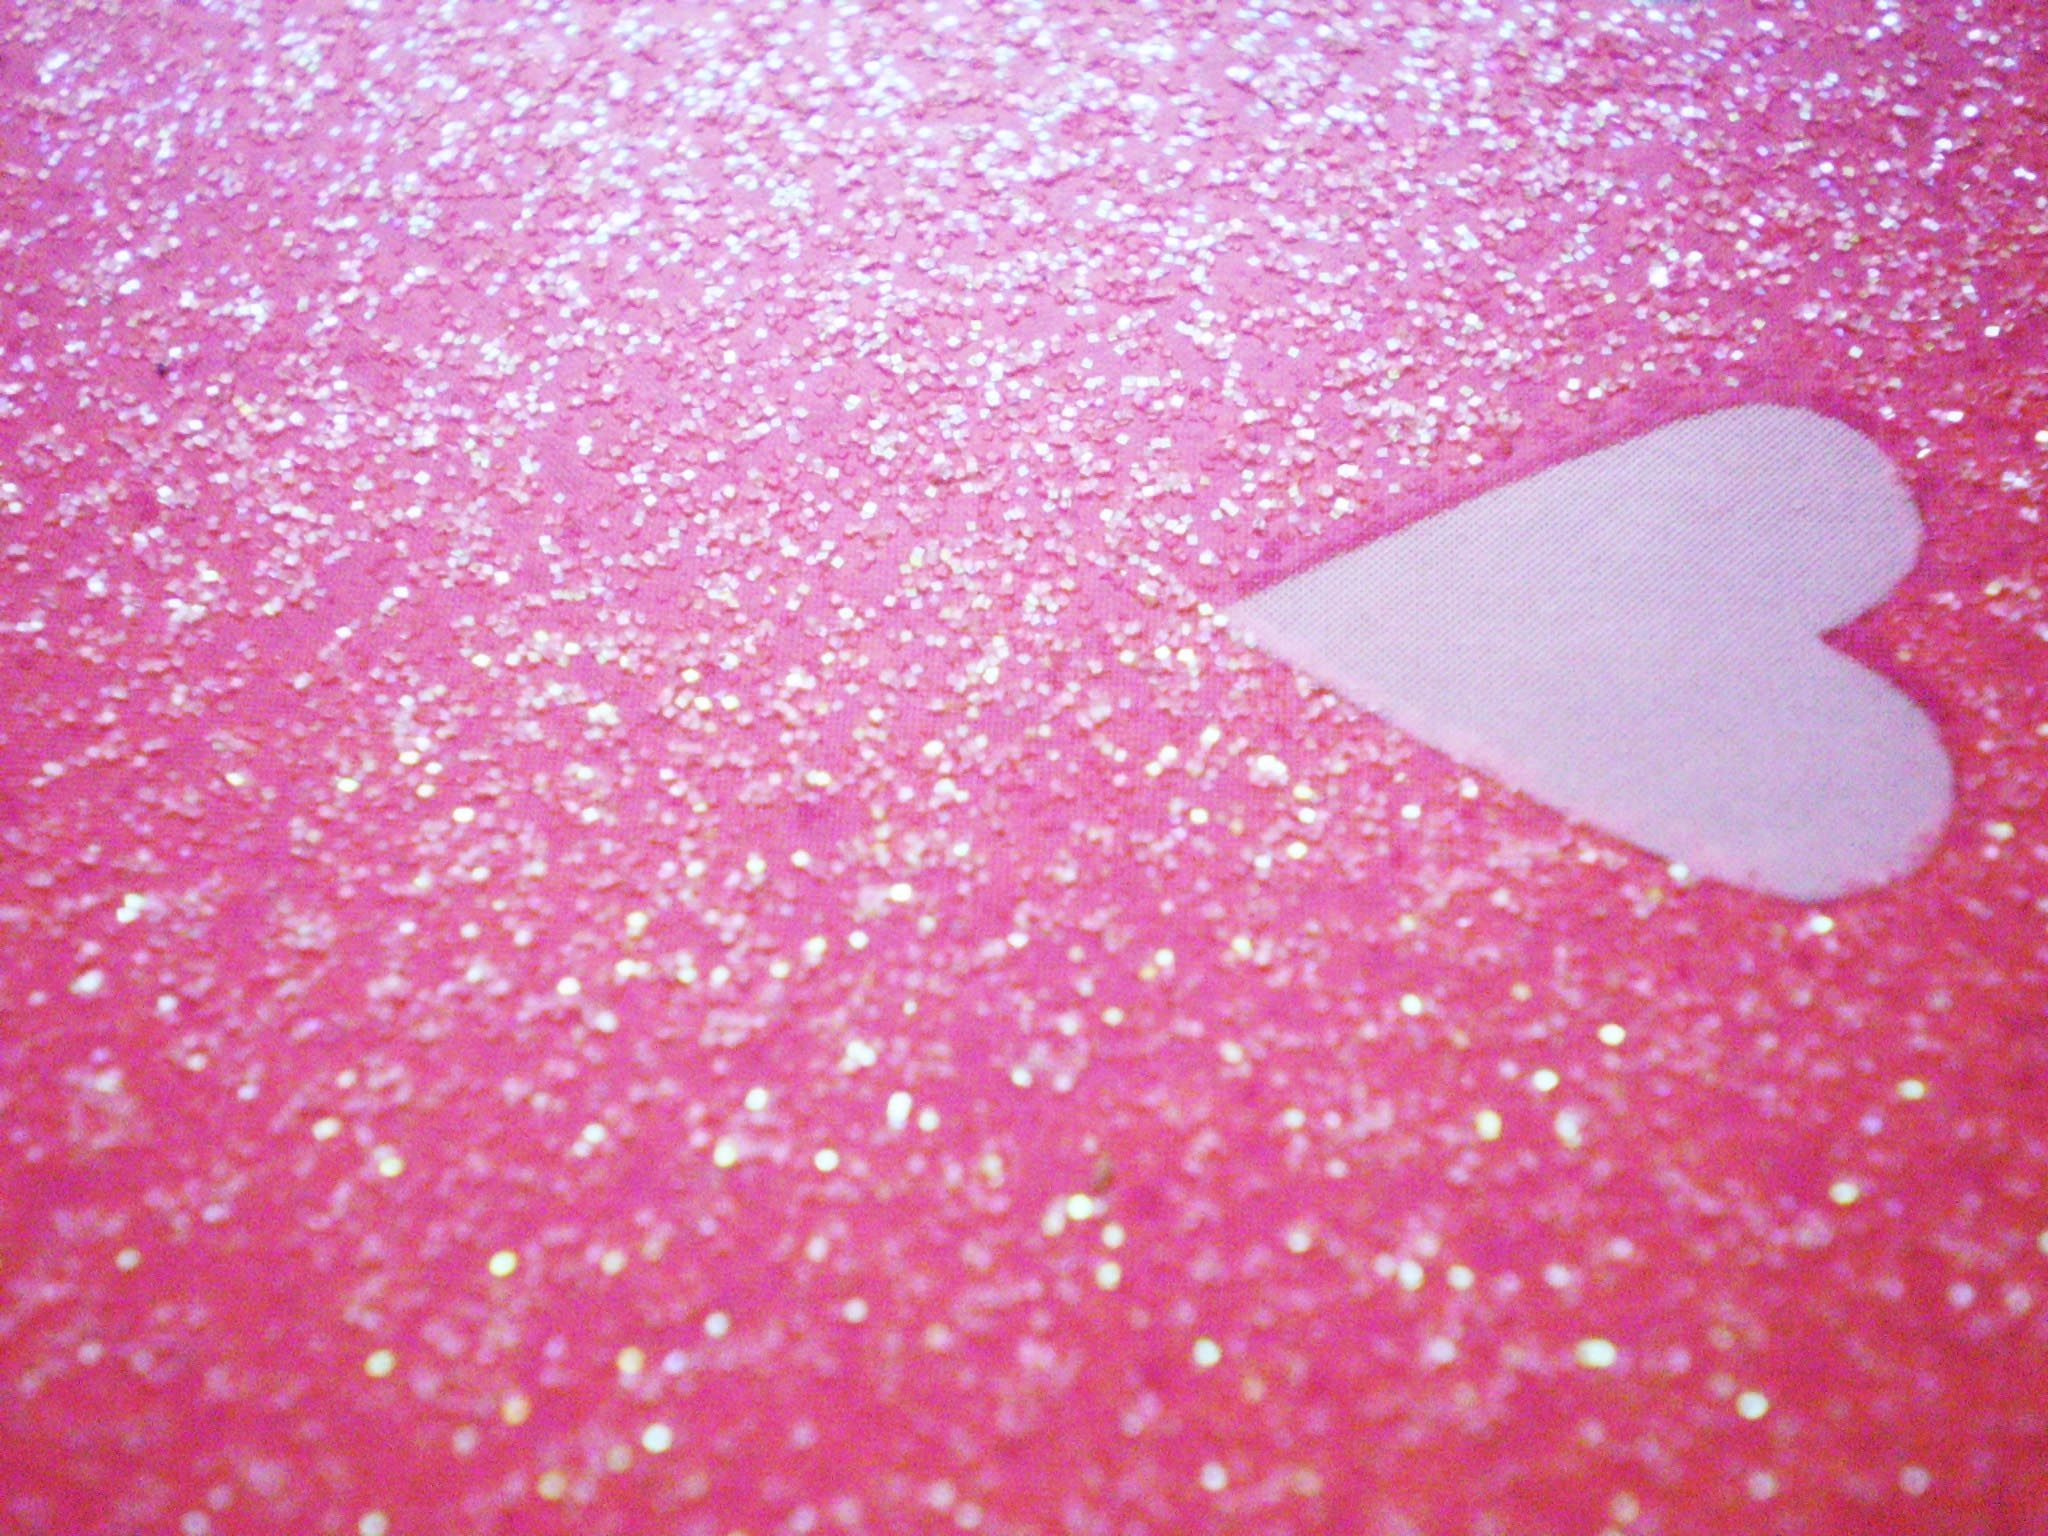 Glitter Wallpaper - Cute Glitter - HD Wallpaper